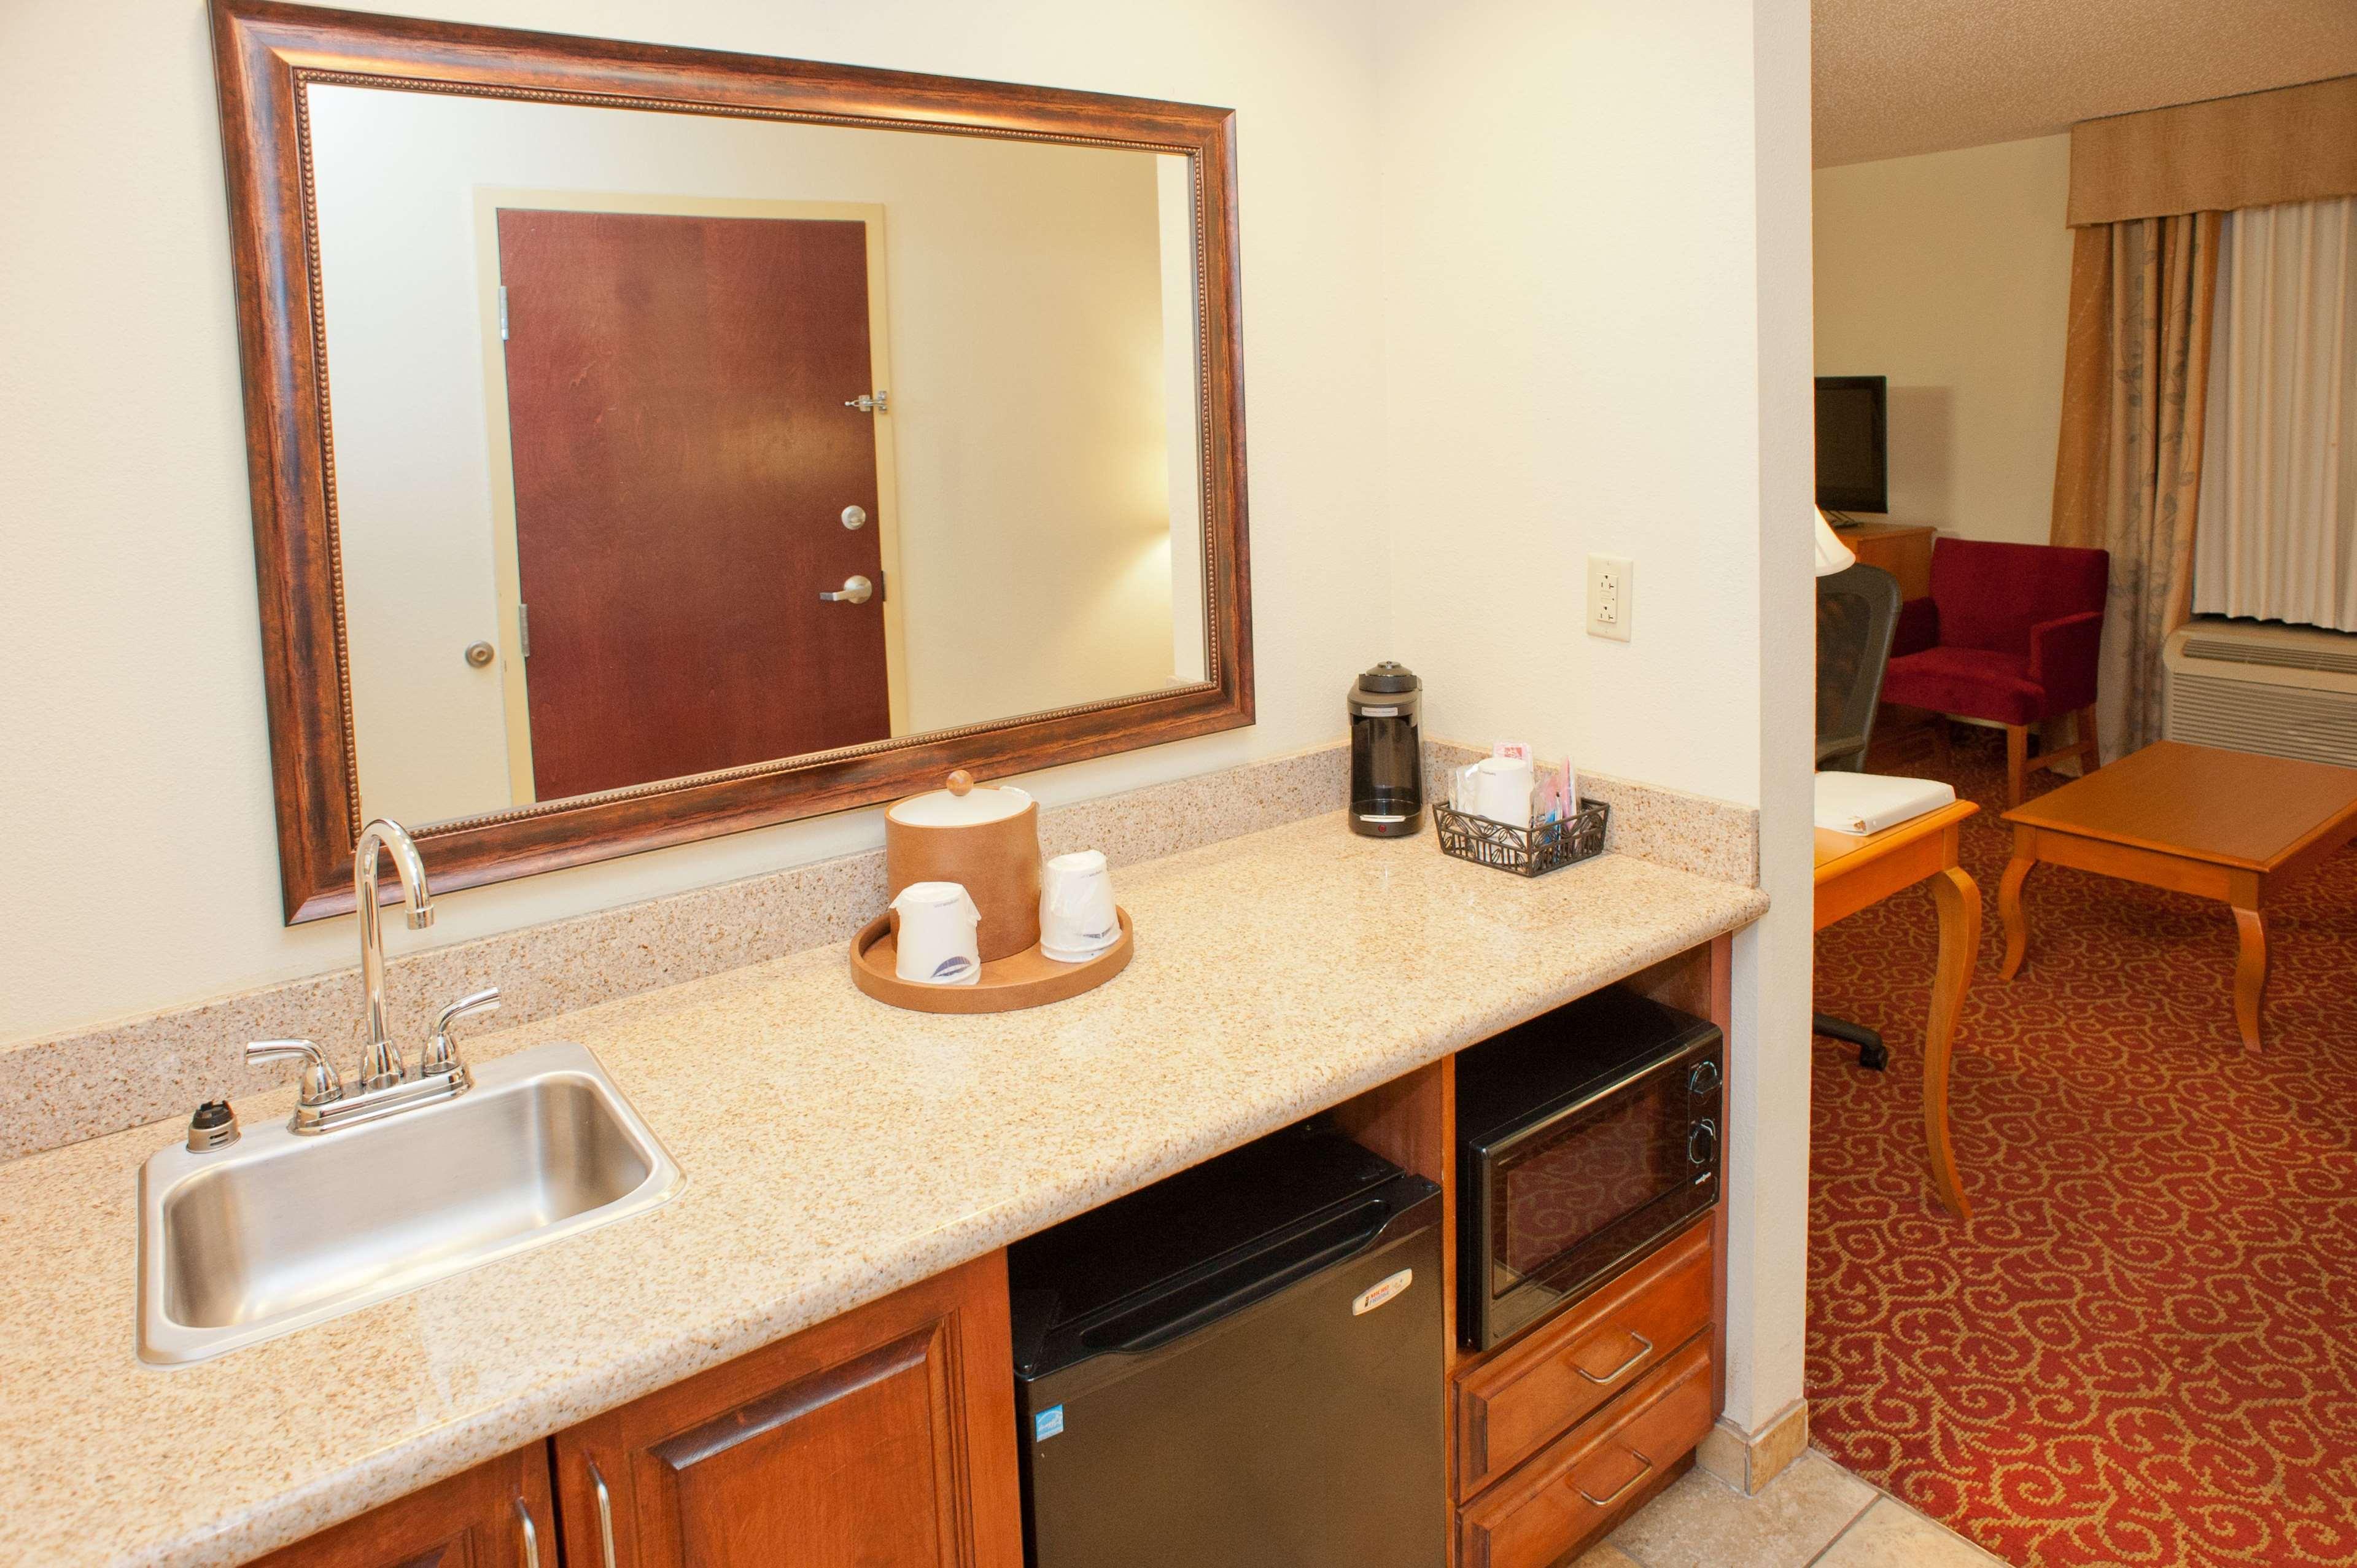 Hampton Inn & Suites Thibodaux image 9